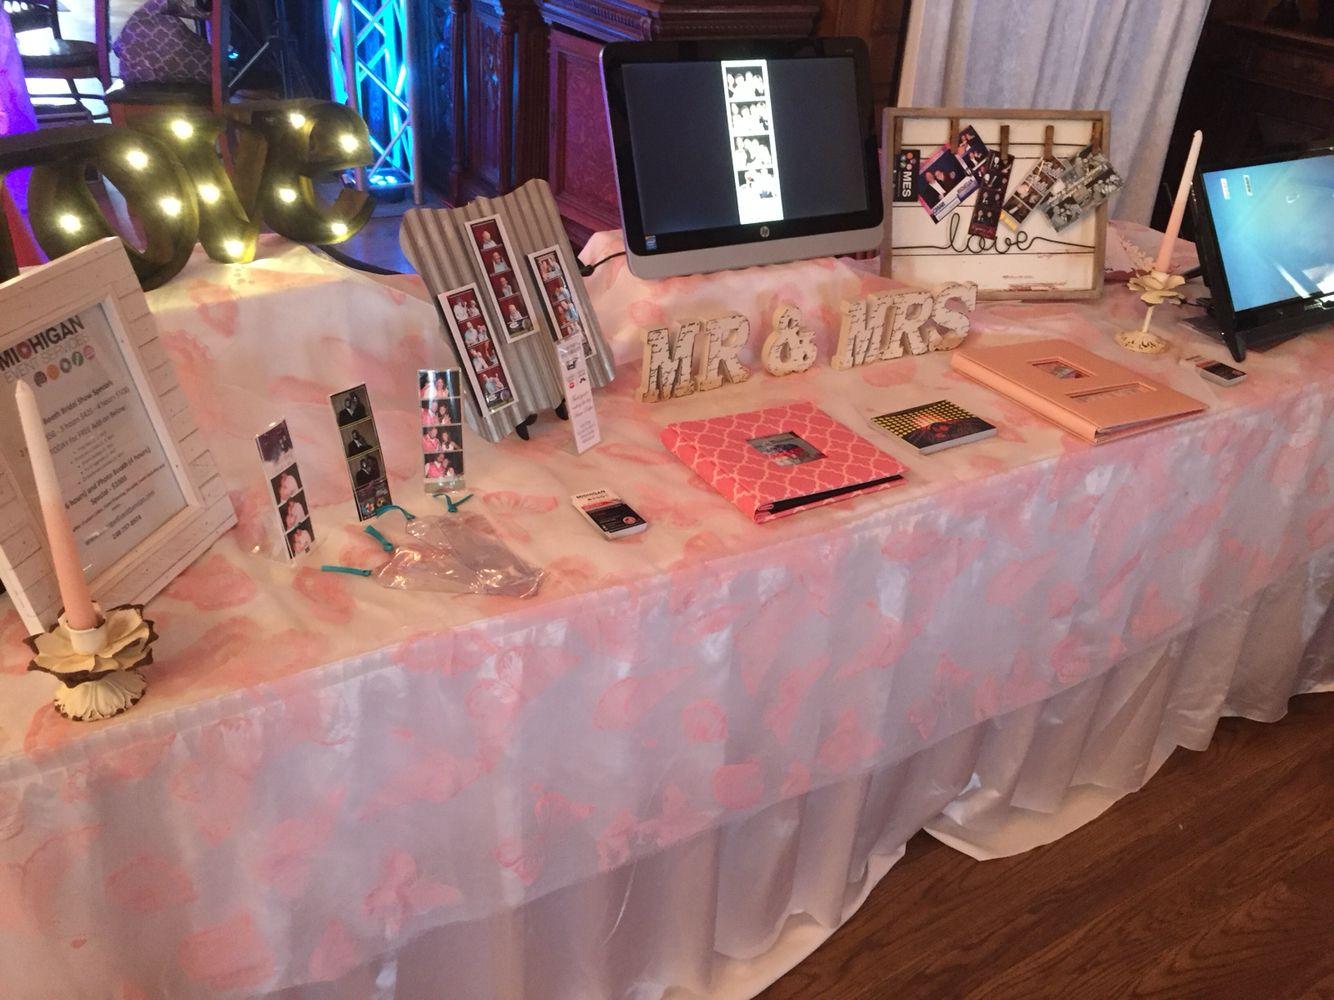 Michigan Bridal Show - Michigan Wedding - Michigan Event Services - Michigan Photo booth - DJ - Custom Cakes - Karaoke - Event Planning - Event Security - www.MichiganEventServices.com